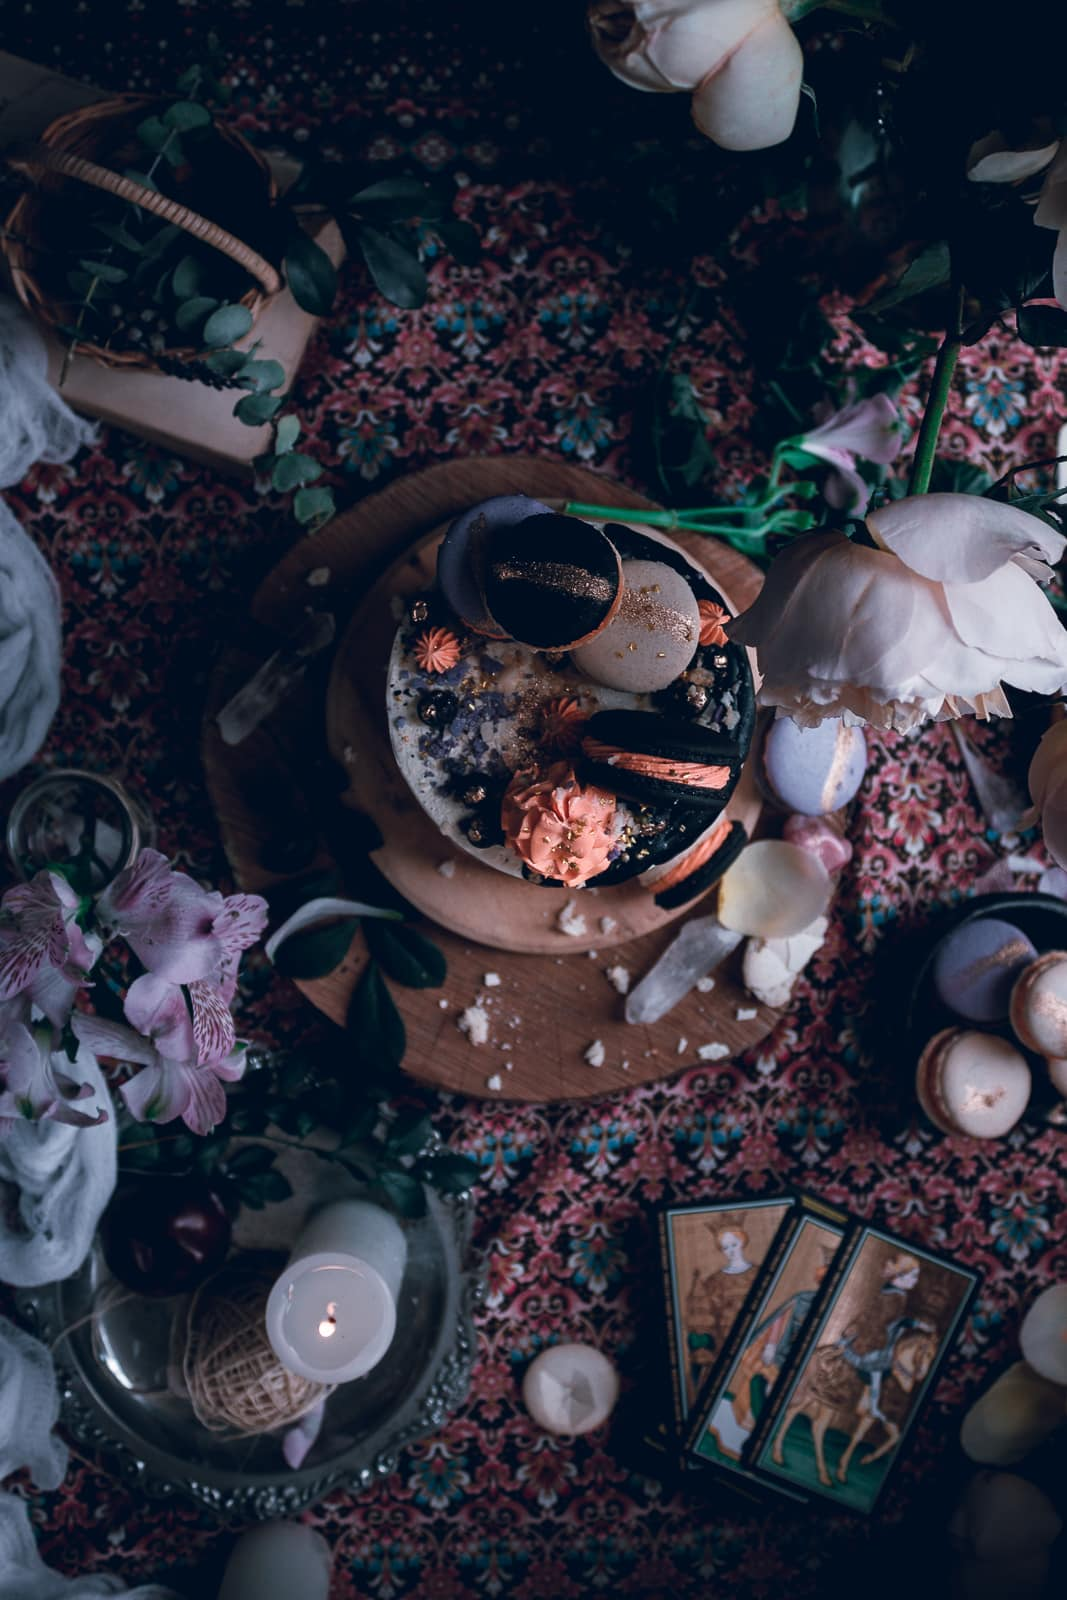 rose_garden_cake-3779